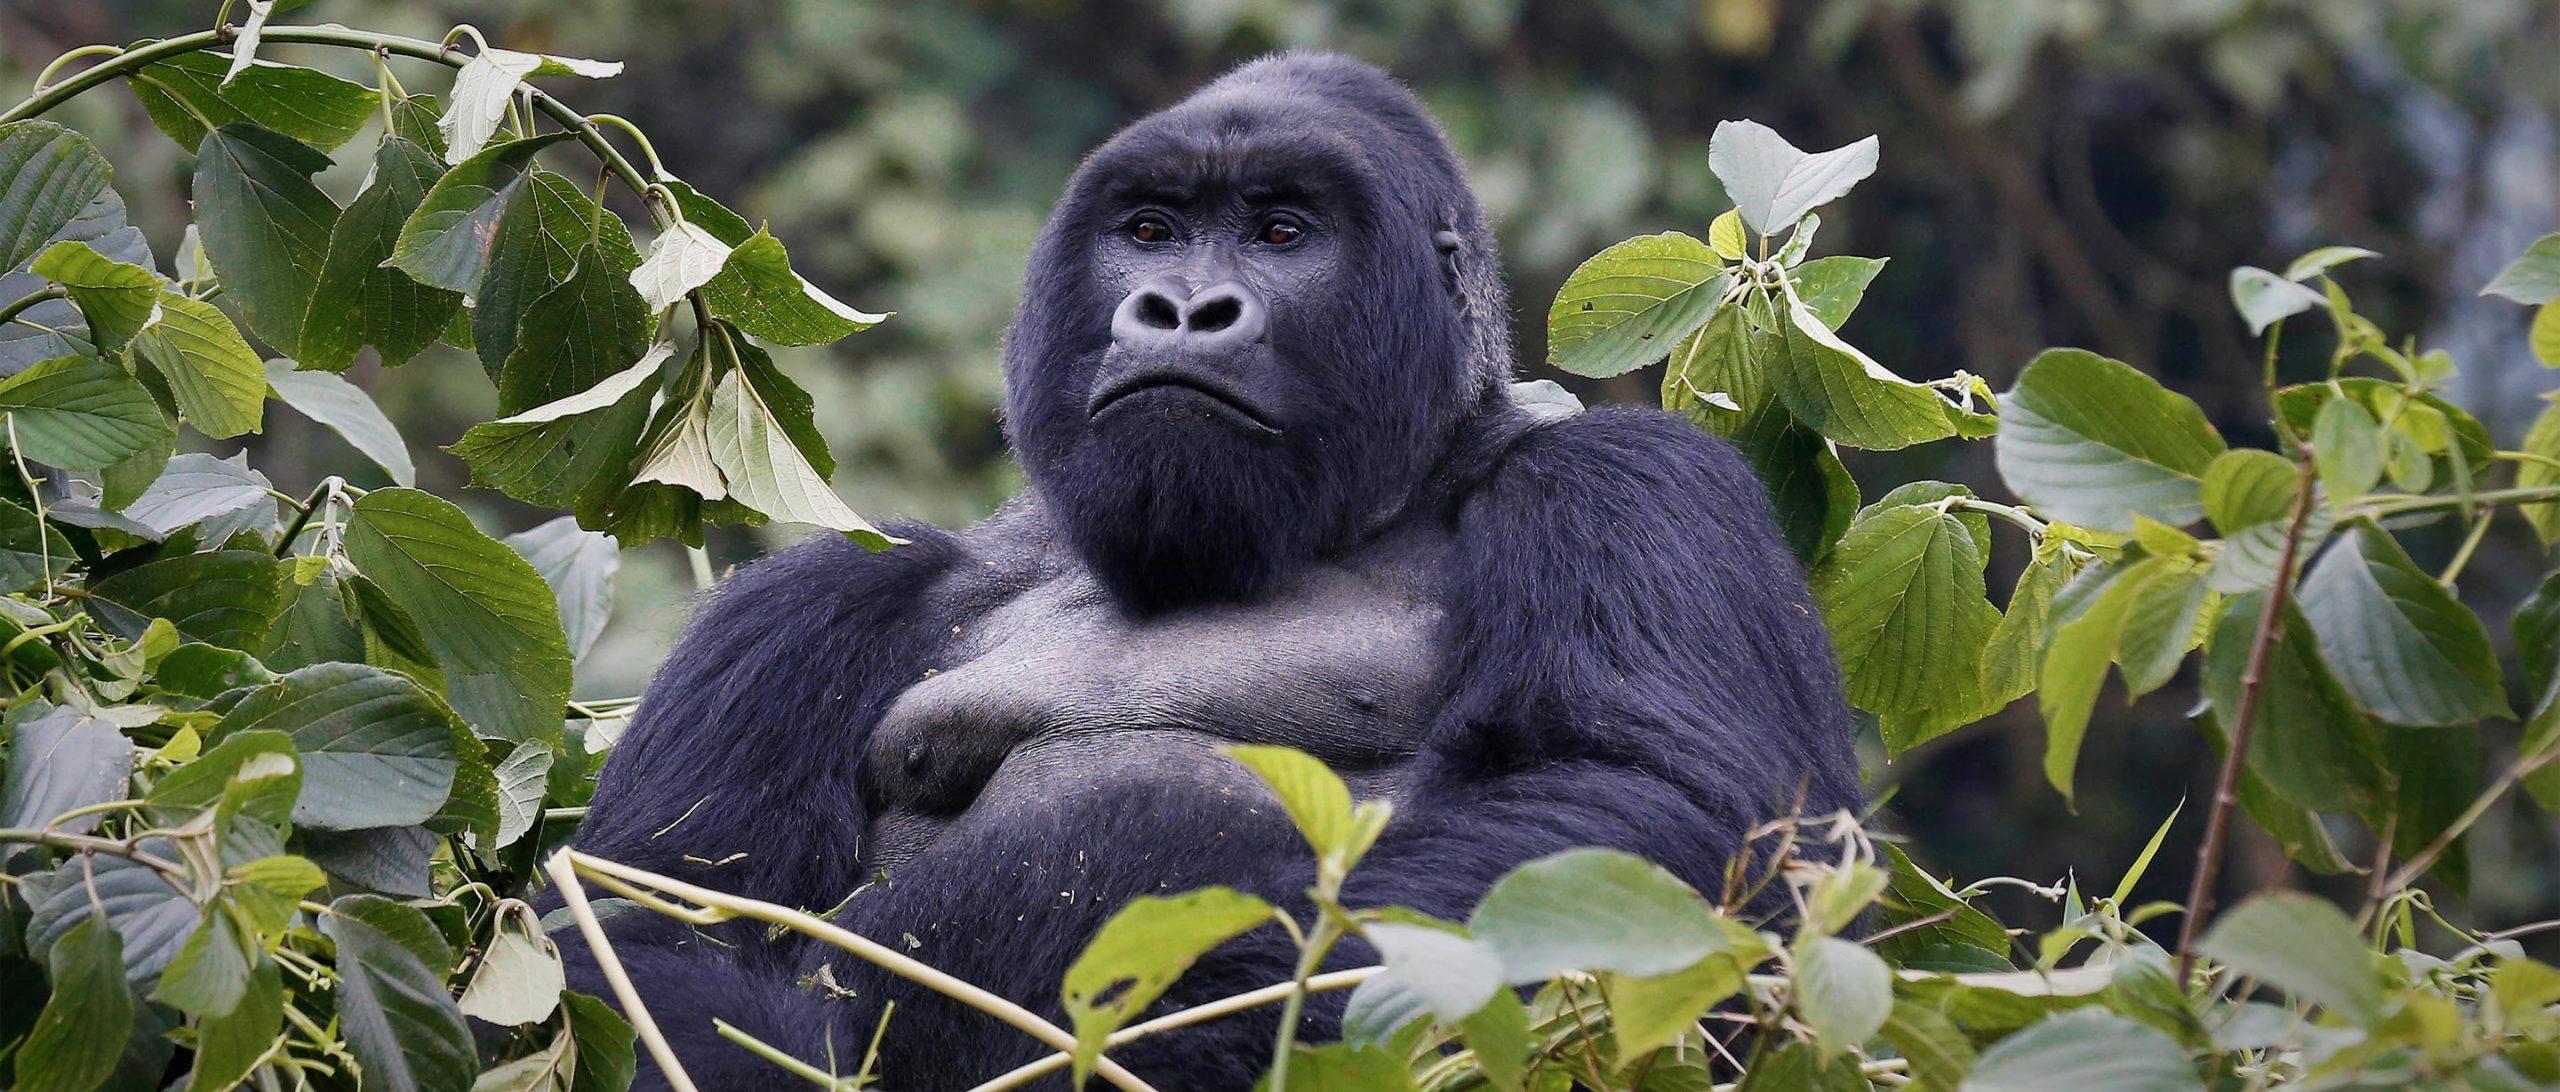 Best place for gorilla trekking in Uganda